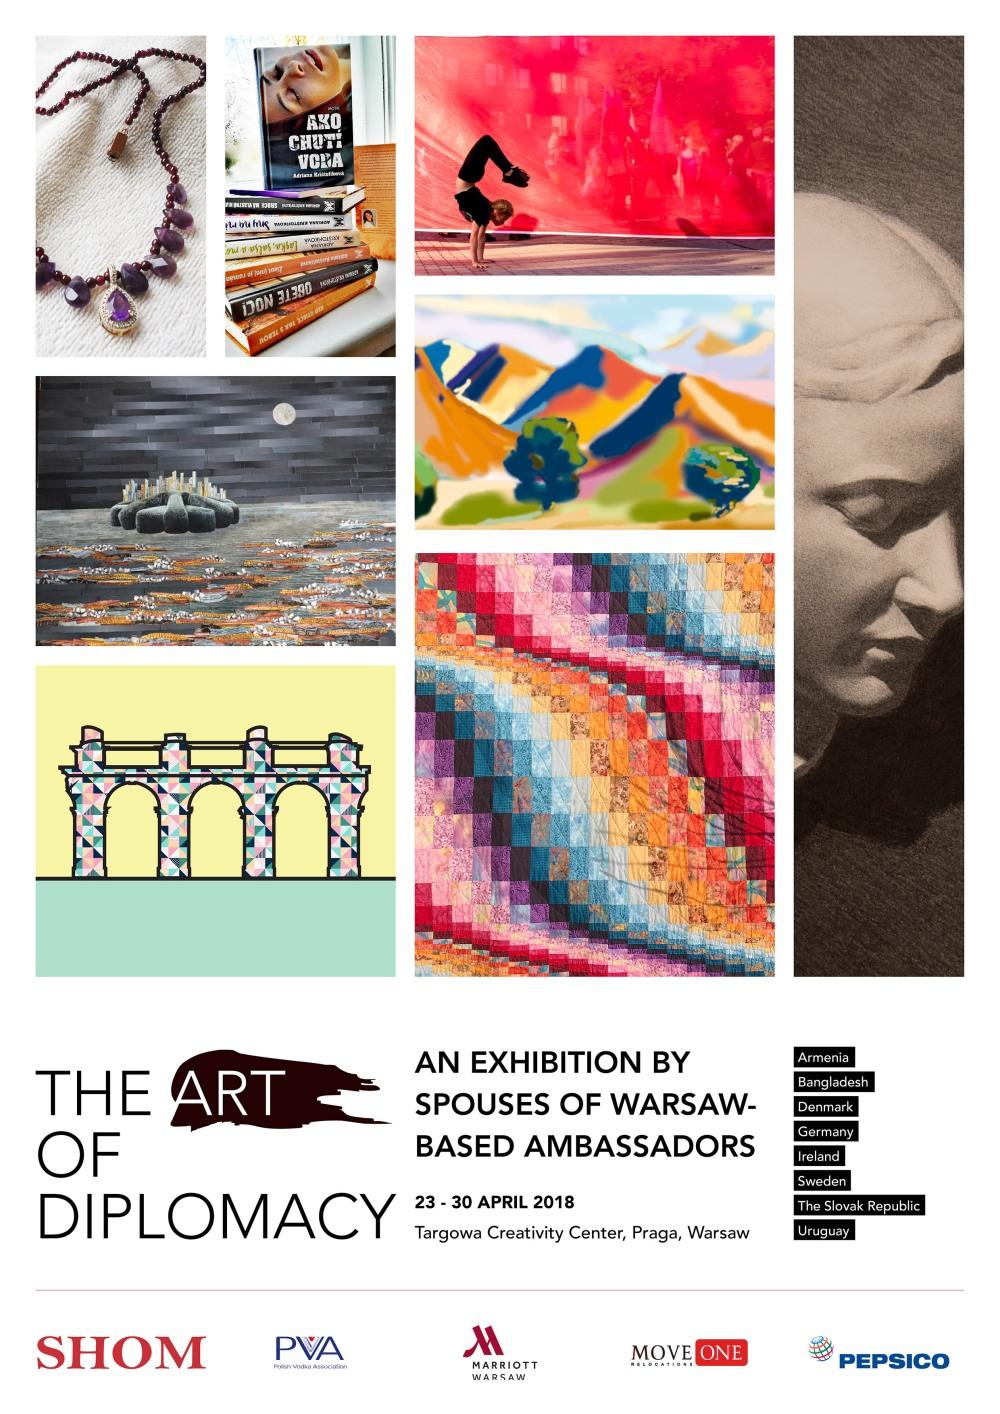 SHOM exhibition poster A2 1